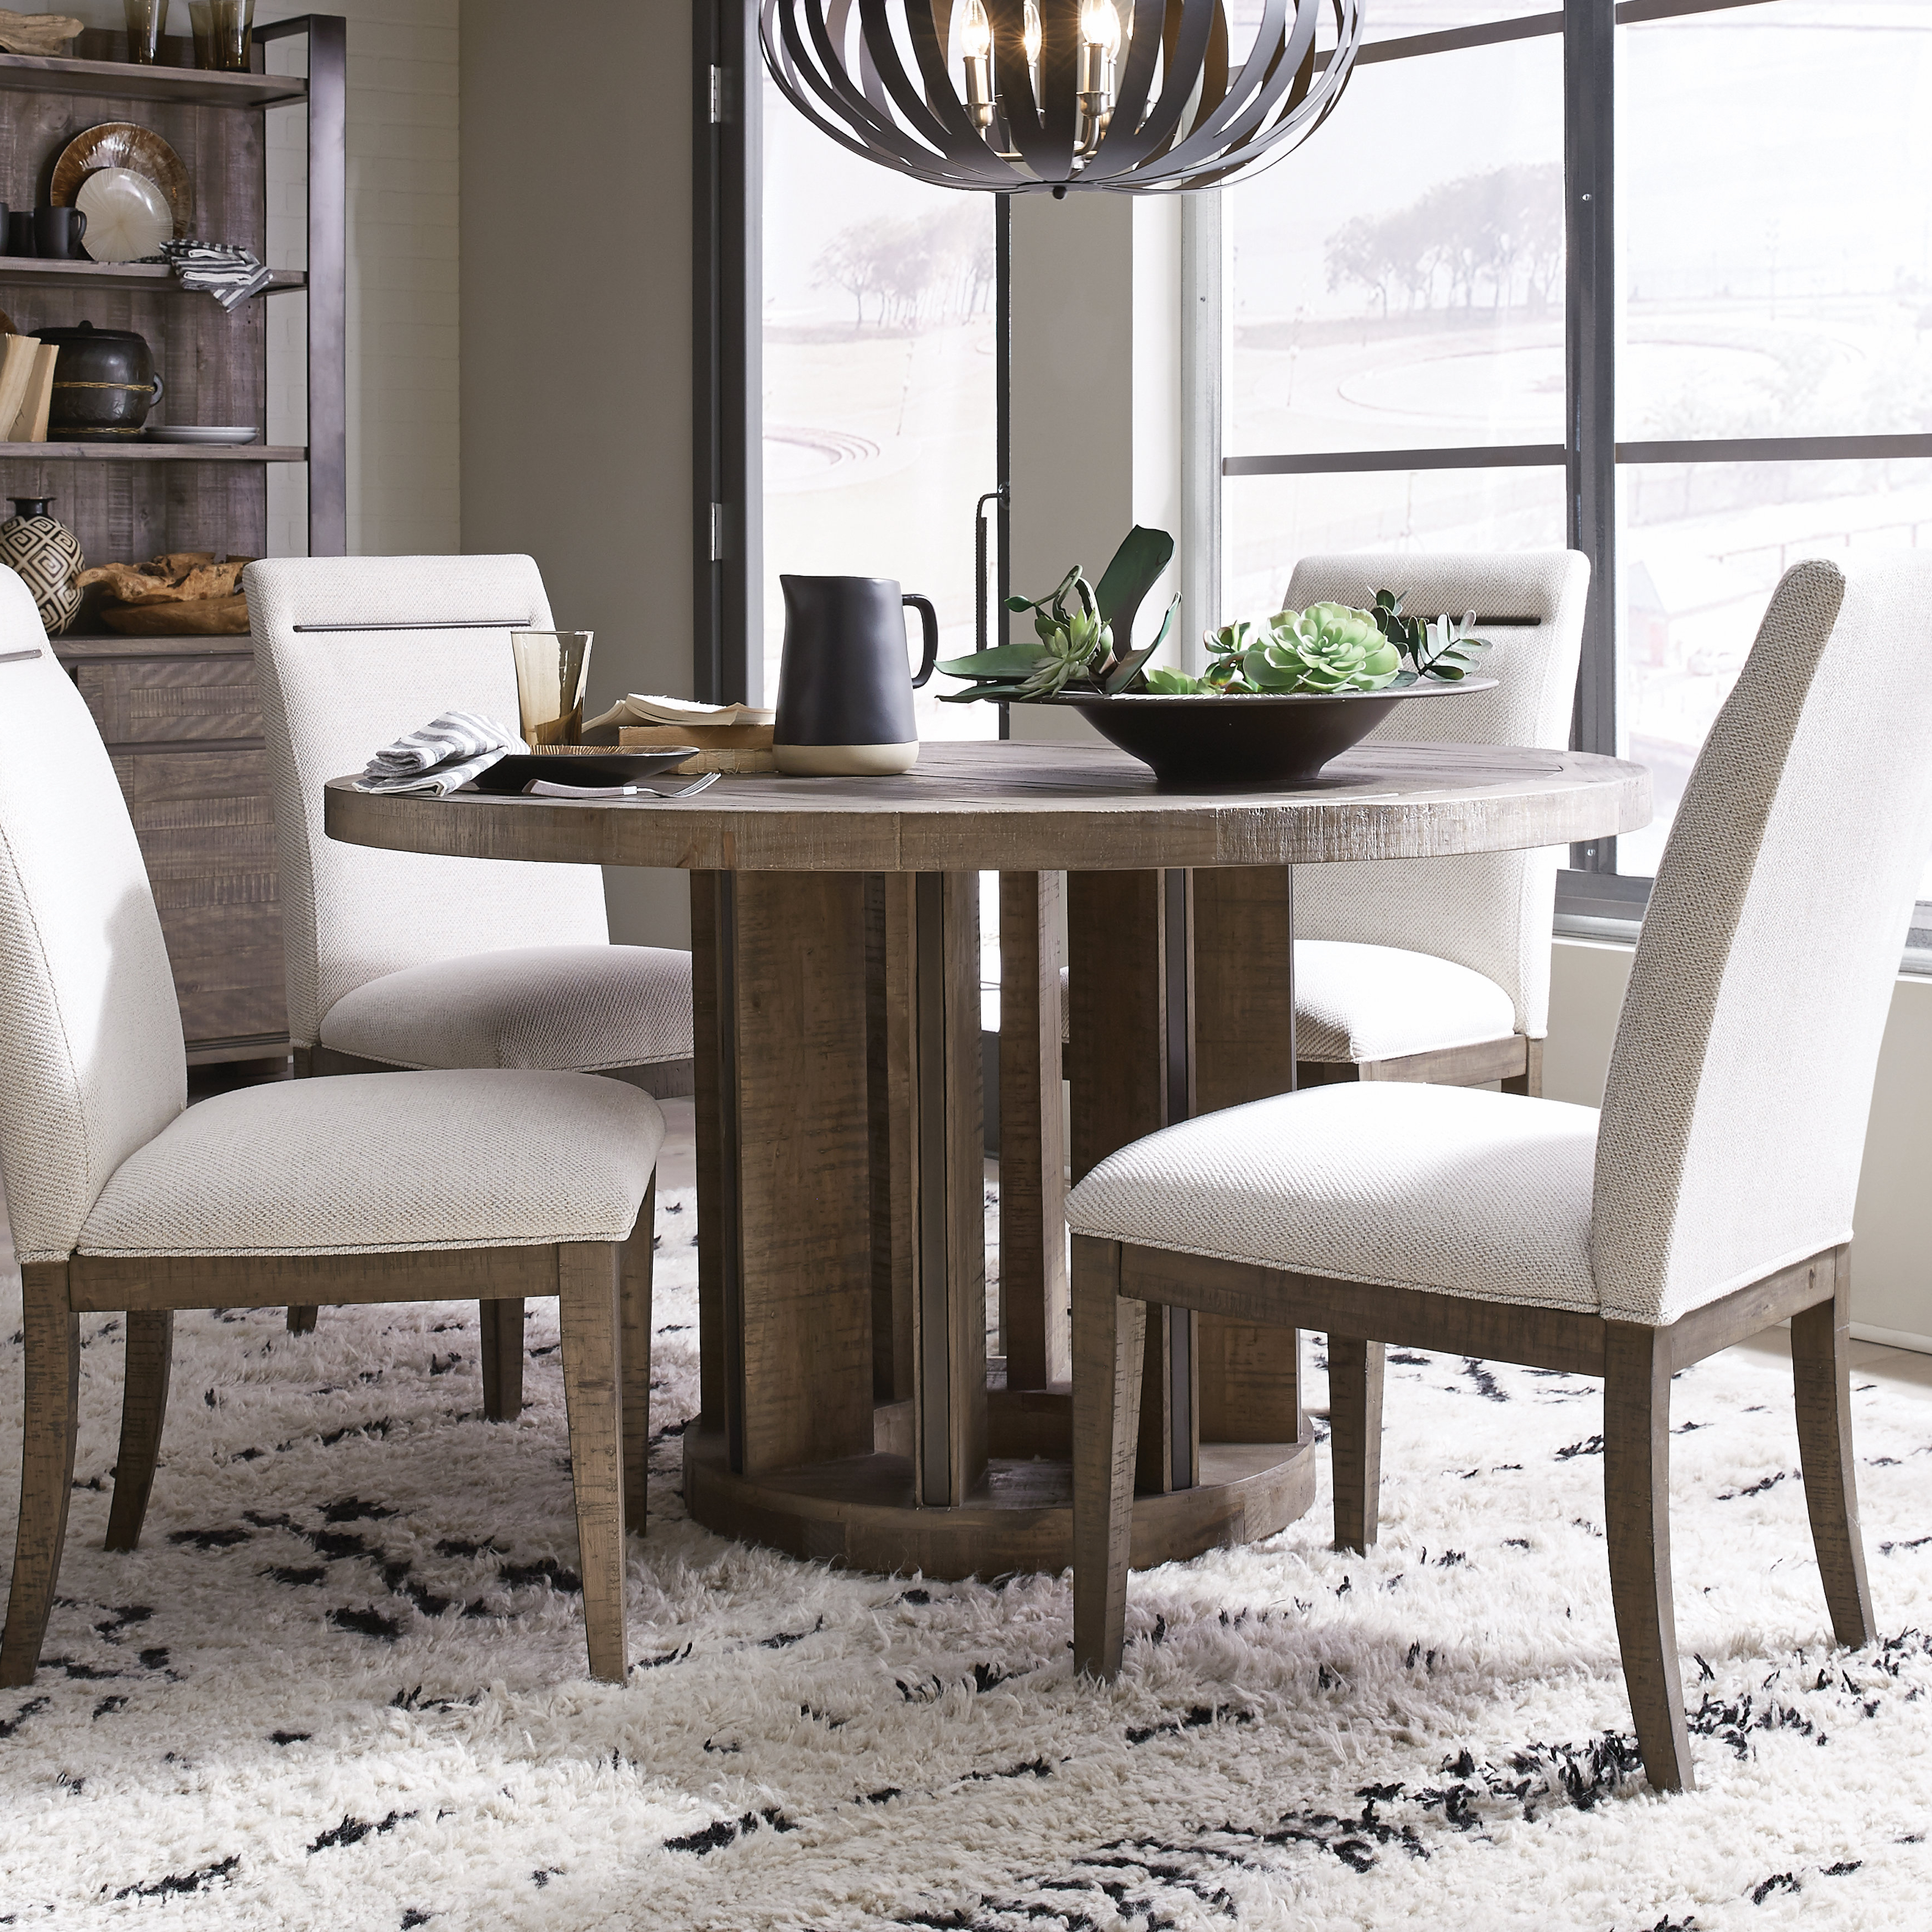 Preferred Sundberg 5 Piece Solid Wood Dining Sets For Norah 5 Piece Solid Wood Dining Set (View 11 of 20)